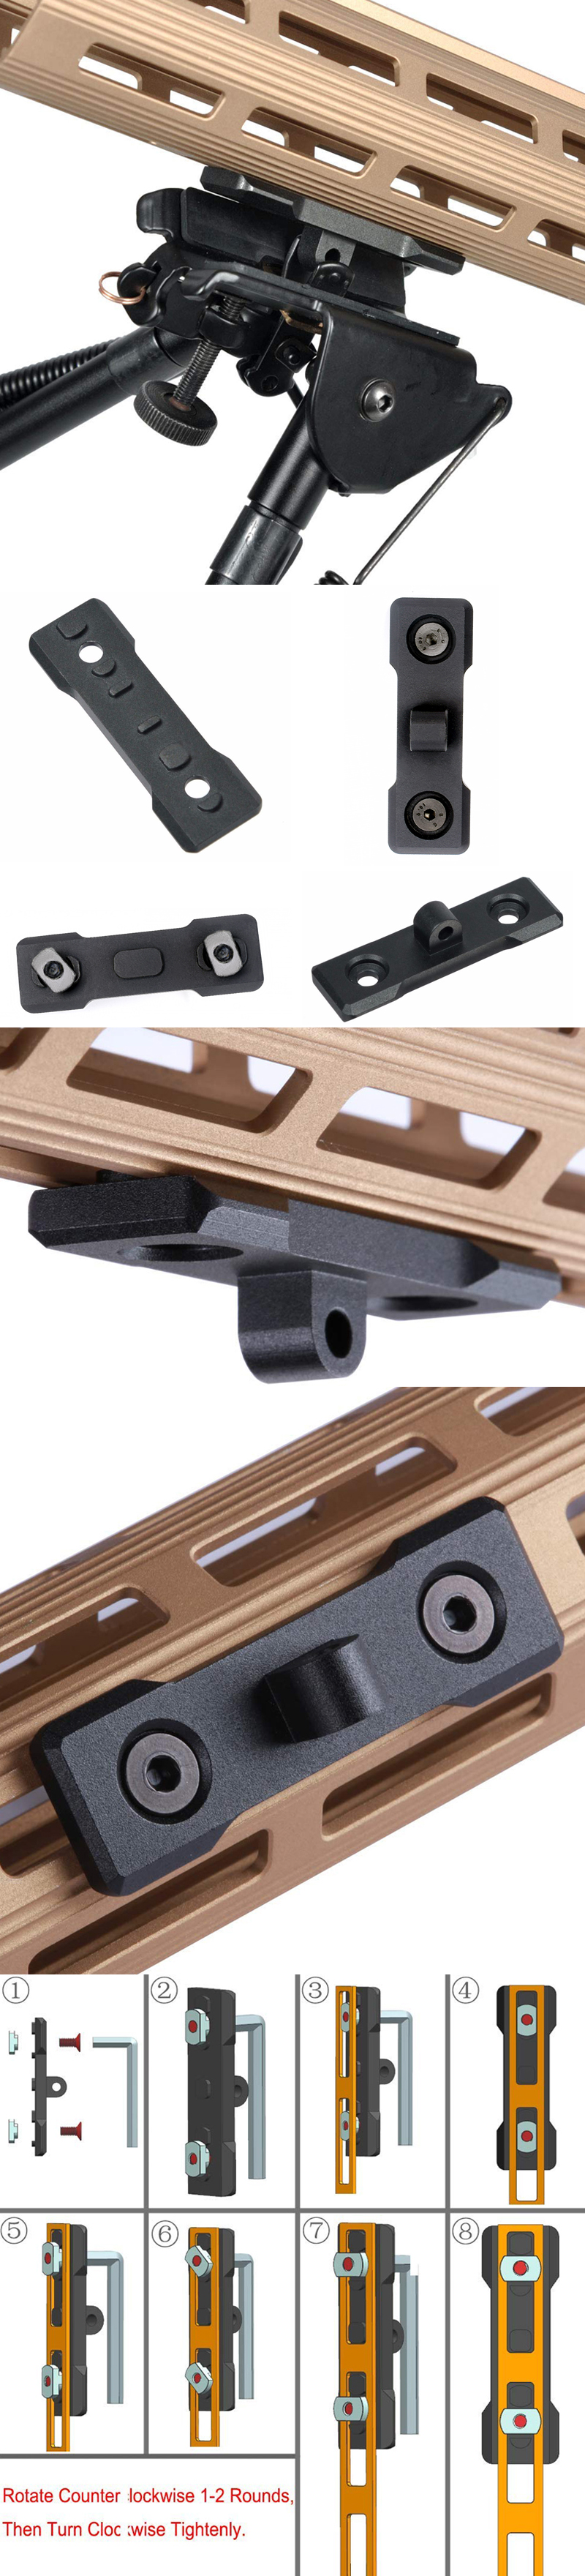 Tactical M-LOK Bipod Mount Outdoor Hunting Handguard Adapter Aluminum Alloy Mlok Accessories